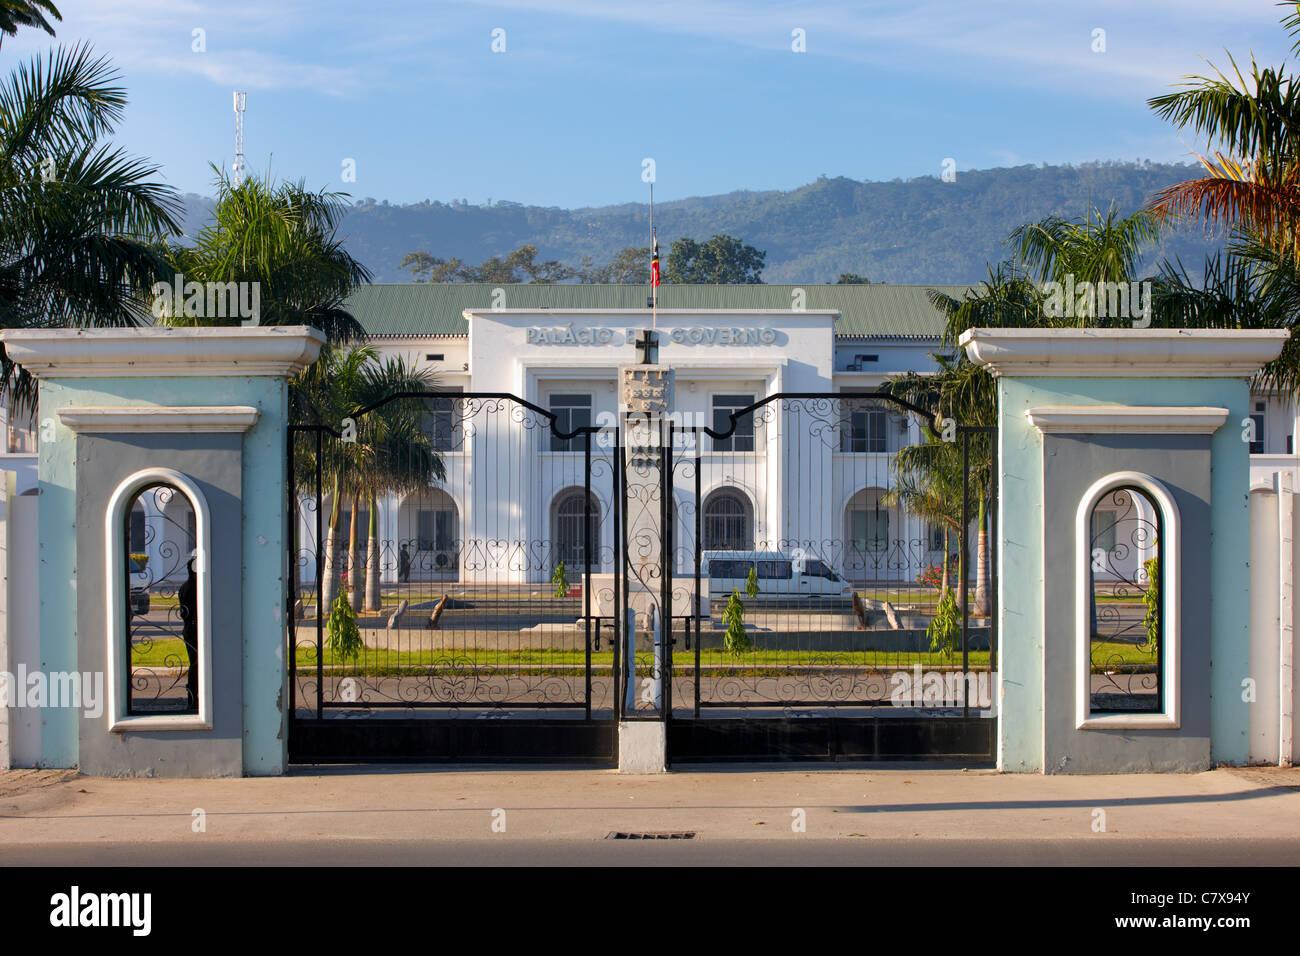 Palacio de Gobierno, Dili, Timor-Leste (Timor oriental), l'Asie Banque D'Images